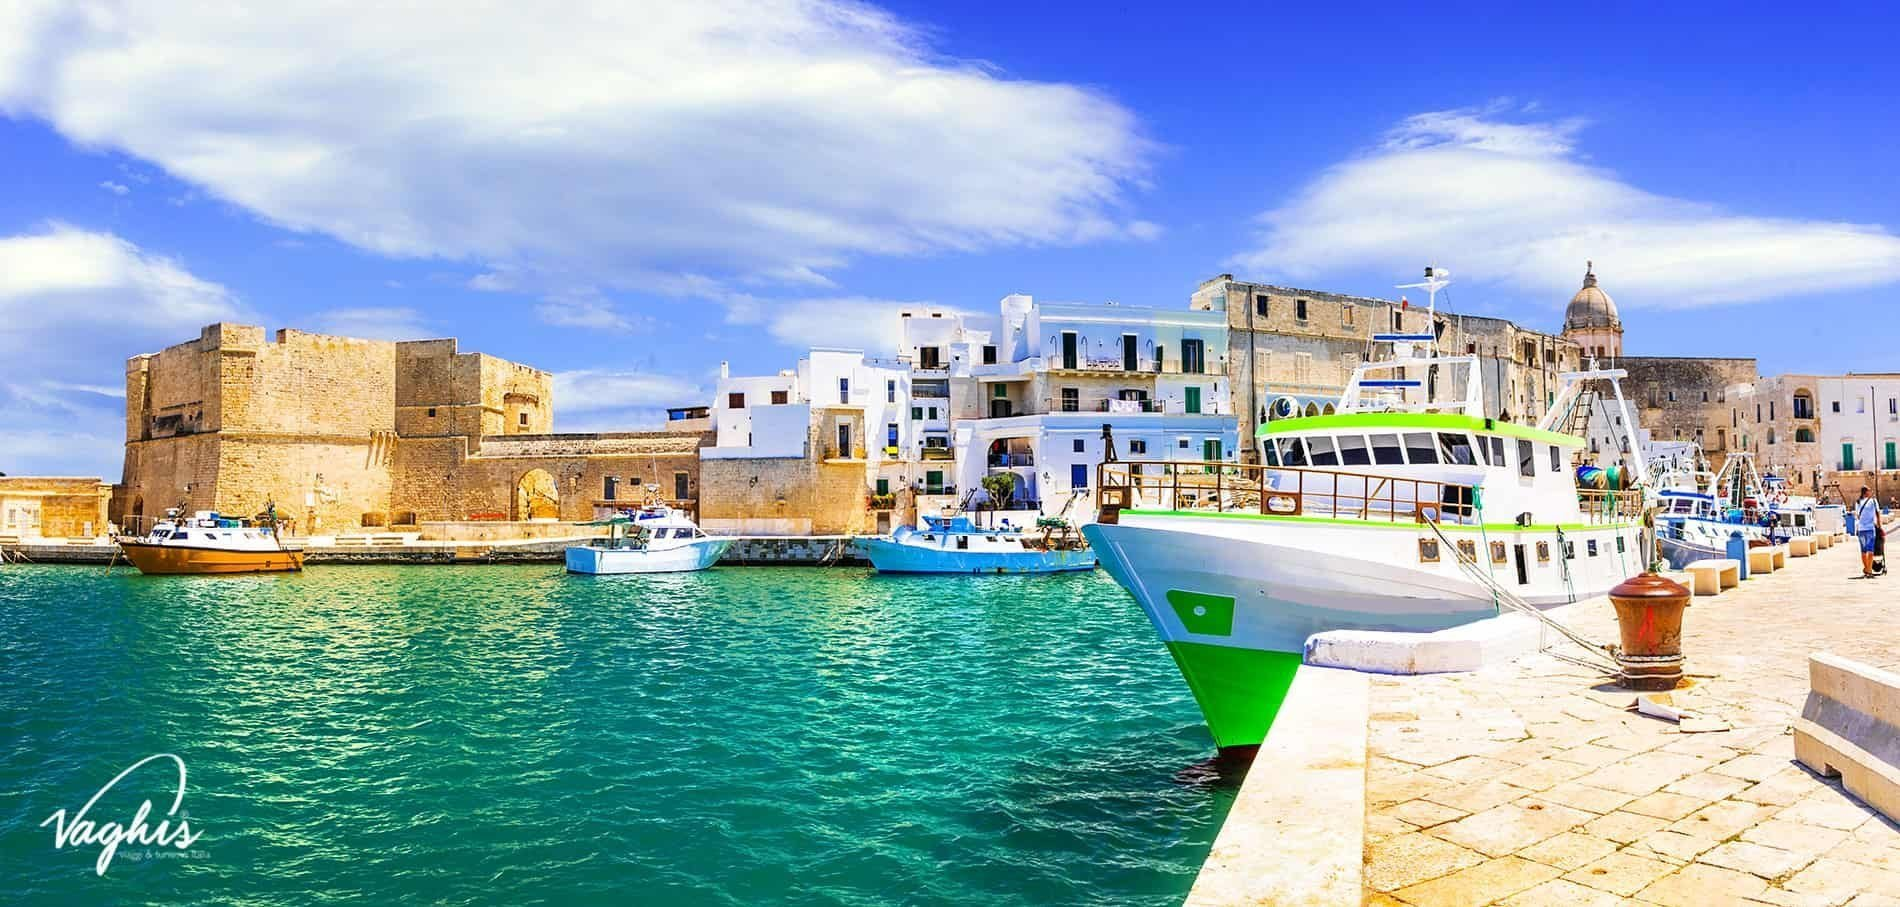 Monopoli - © Vaghis viaggi & turismo Italia - Tutti i diritti riservati